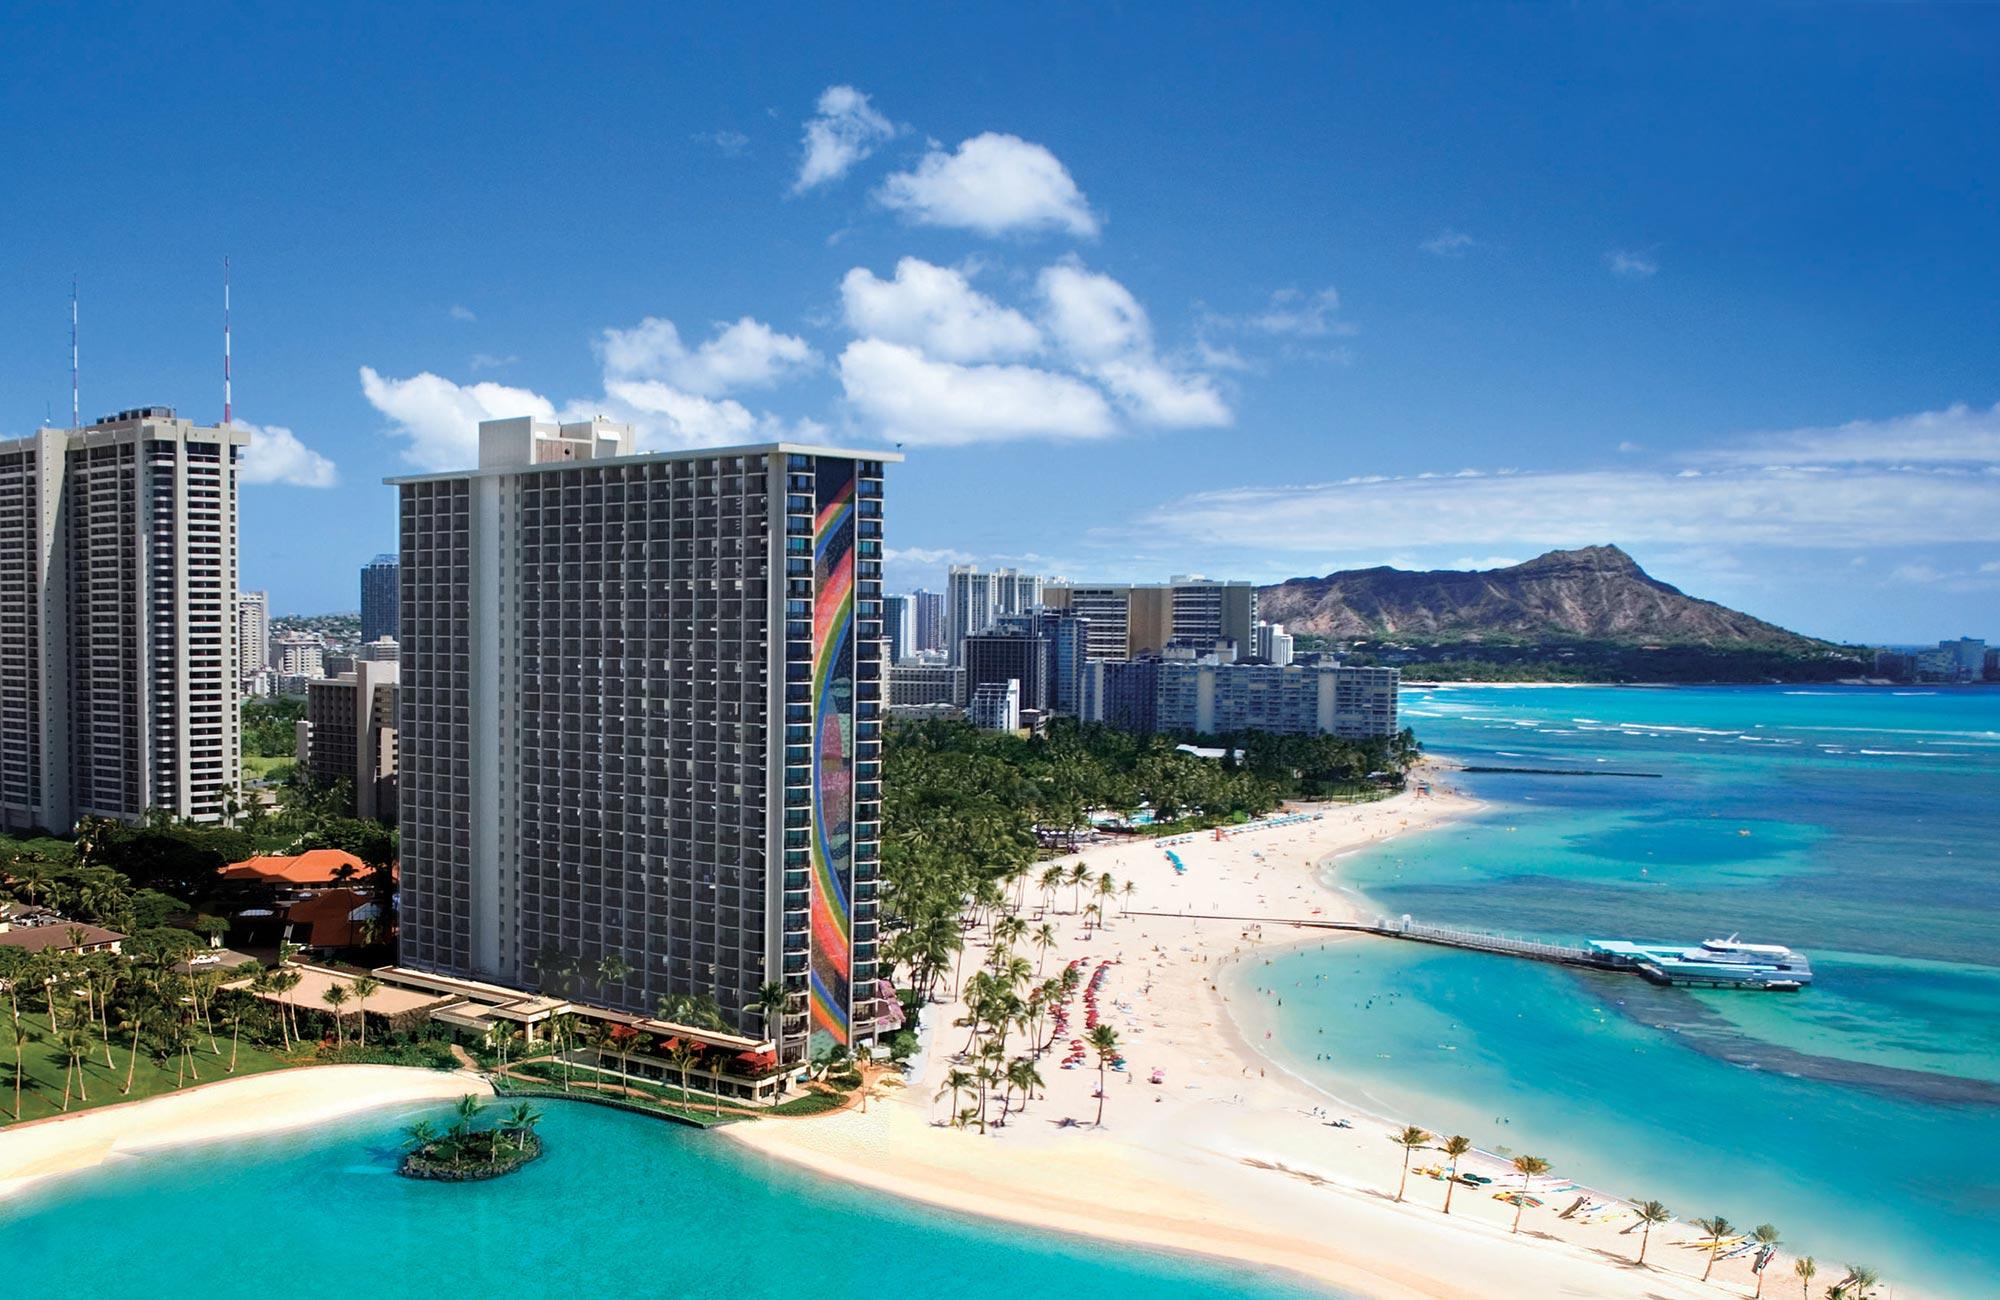 Hilton_Hawaii-Hotel_HIlton-Honolulu-Escapes-on-Sale-+-Extra-Discount